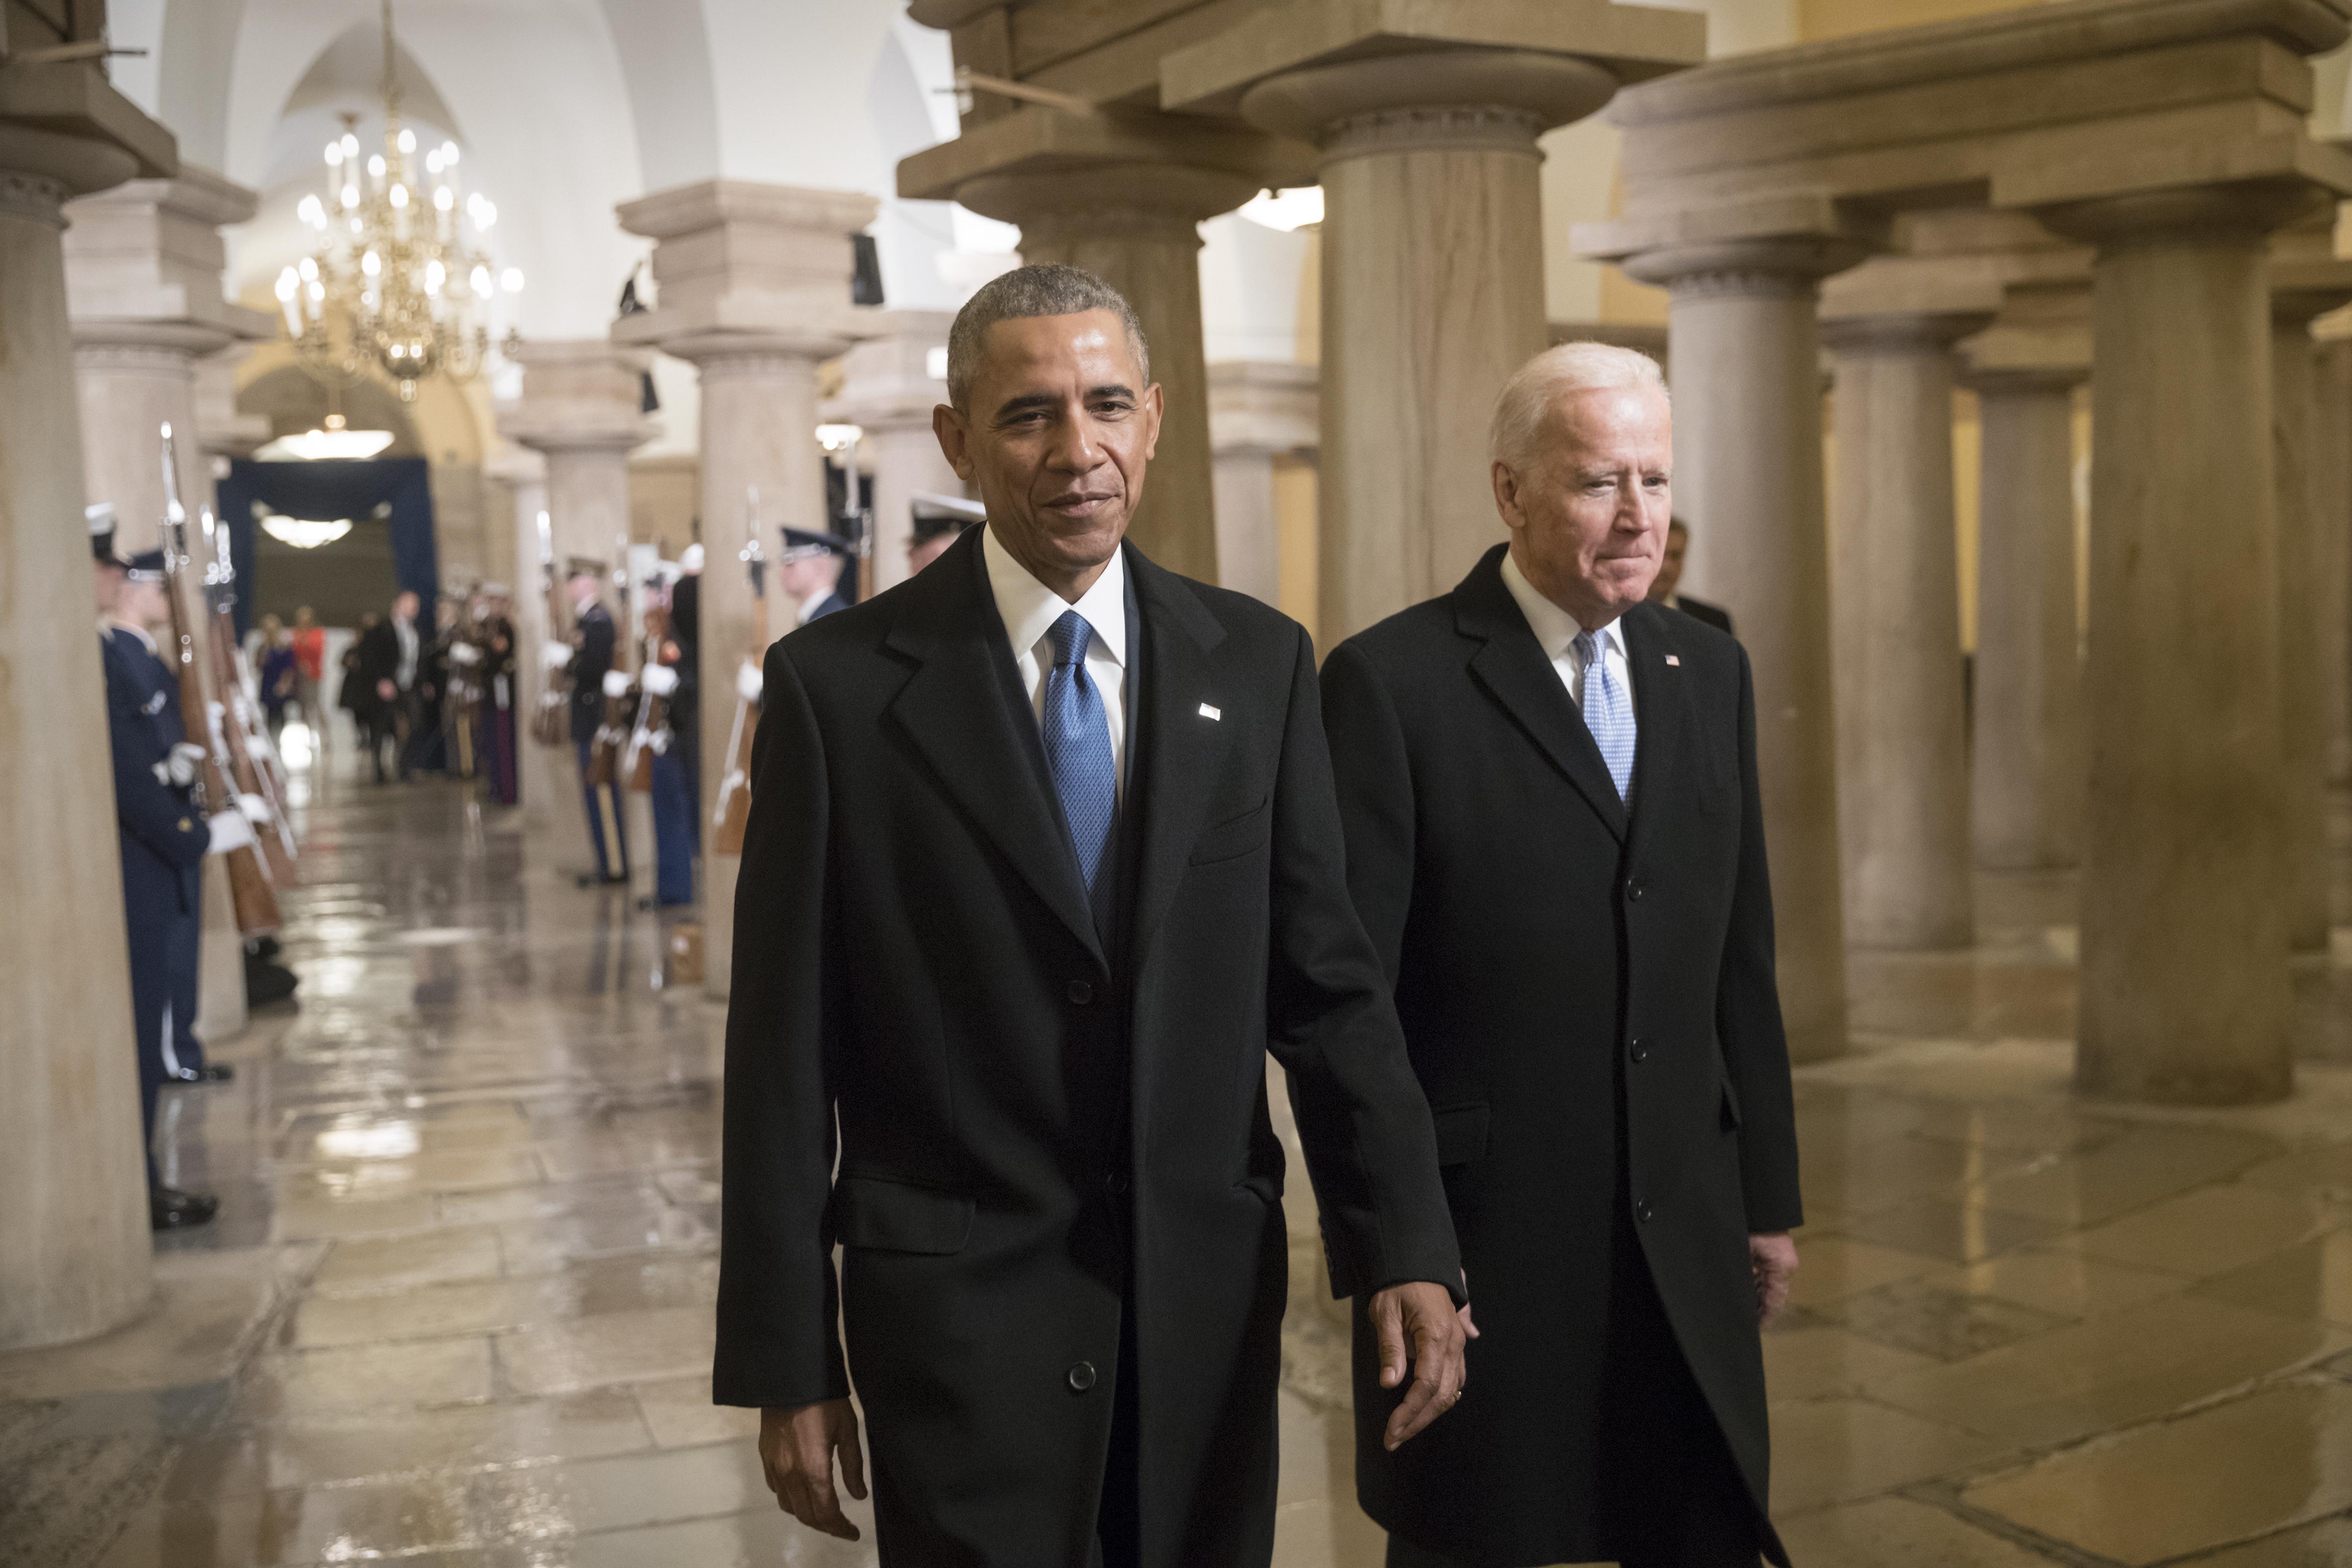 WASHINGTON, DC - JANUARY 20: President Barack Obama and Vice President Joe Biden walk through the Crypt of the Capitol for Donald Trump's inauguration ceremony, in Washington, January 20, 2017. (Photo by J. Scott Applewhite - Pool/Getty Images)